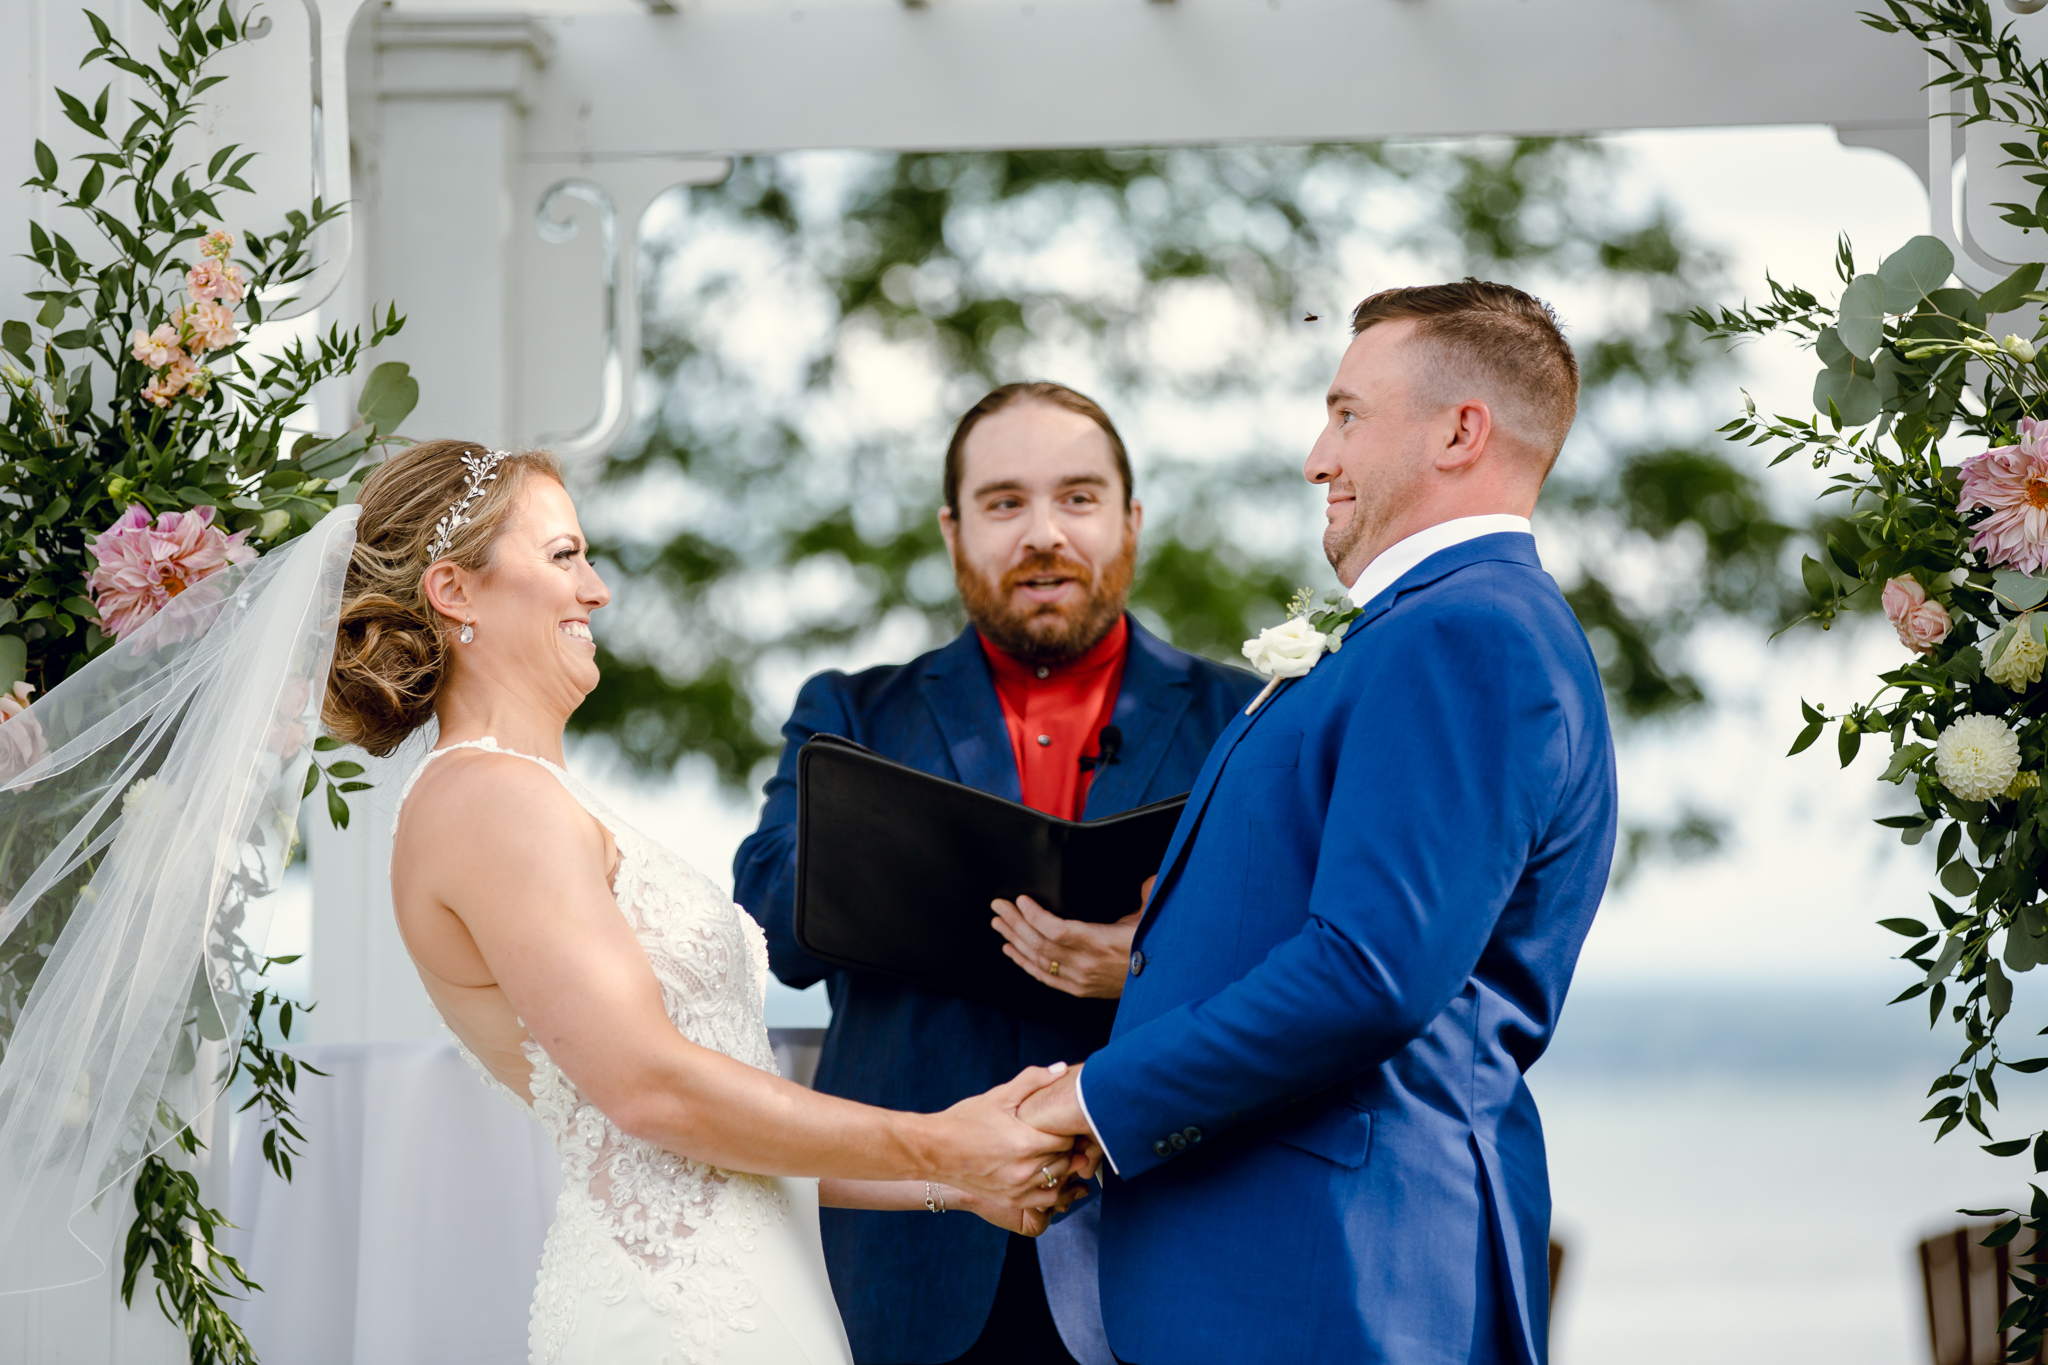 Inn on the Lake Canandaigua Wedding Photography by Buffalo Wedding Photographer Becca Sutherland Photography